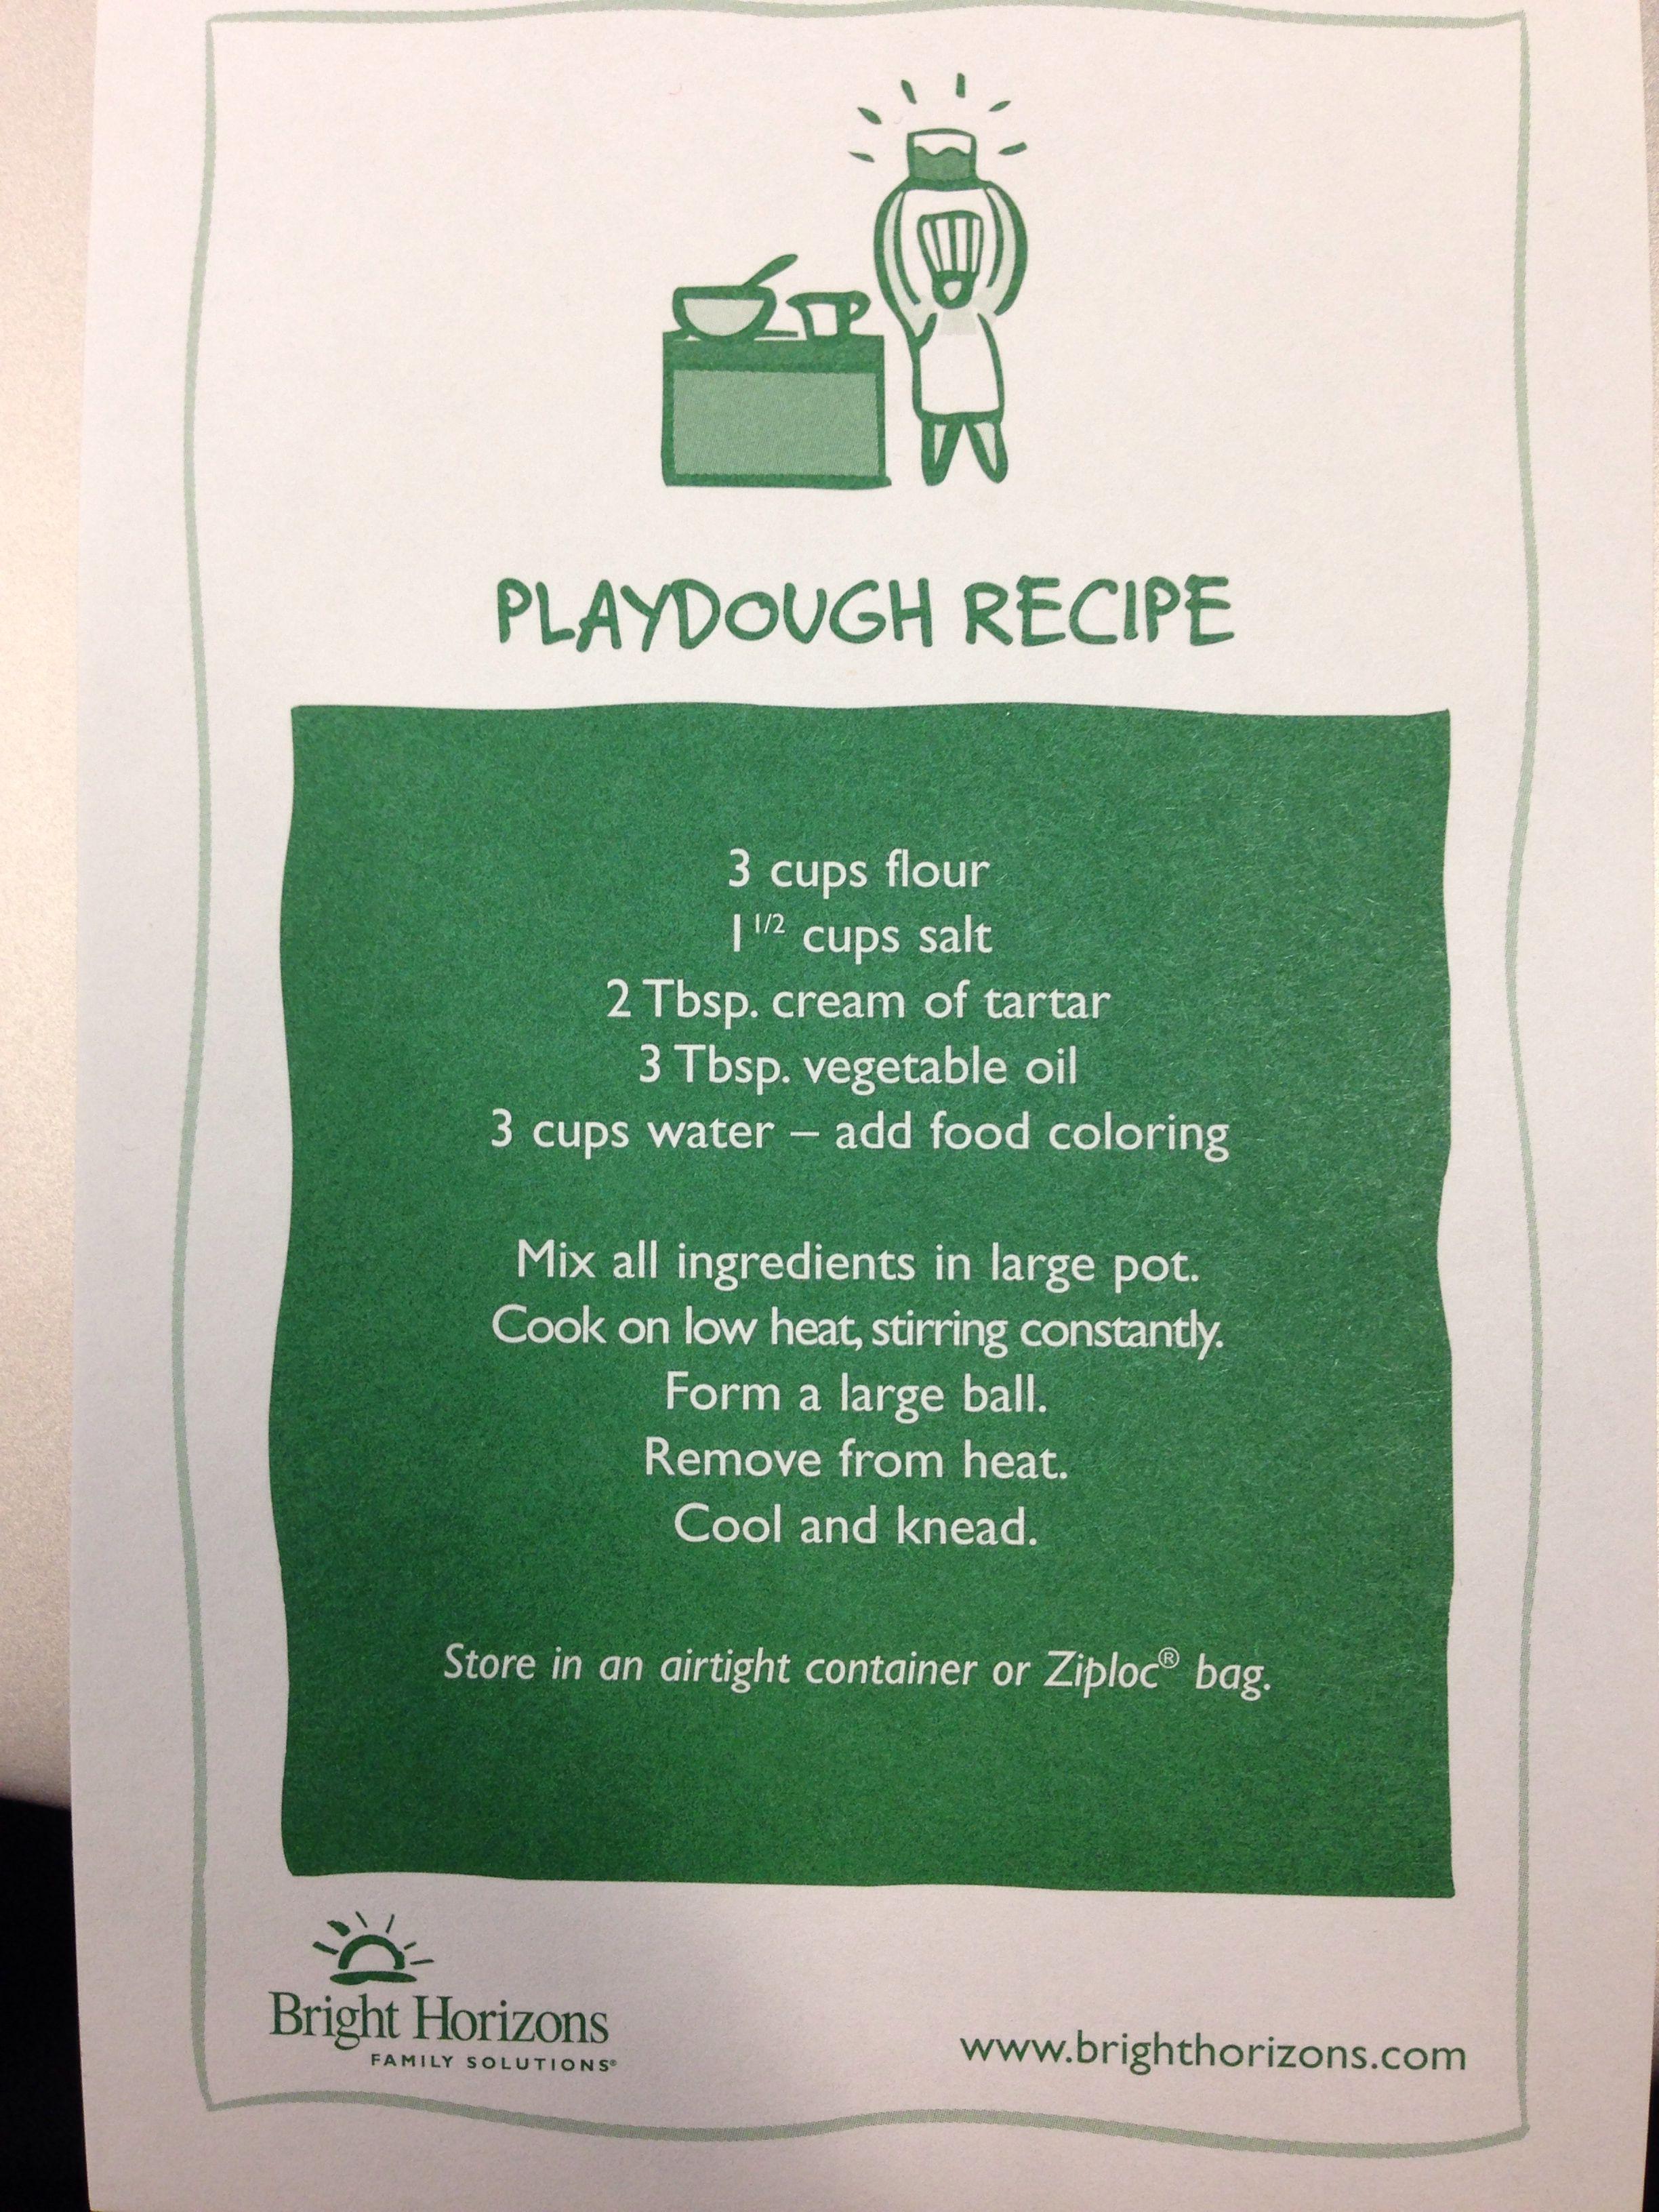 Playdough recipe from Bright Horizons Playdough recipe